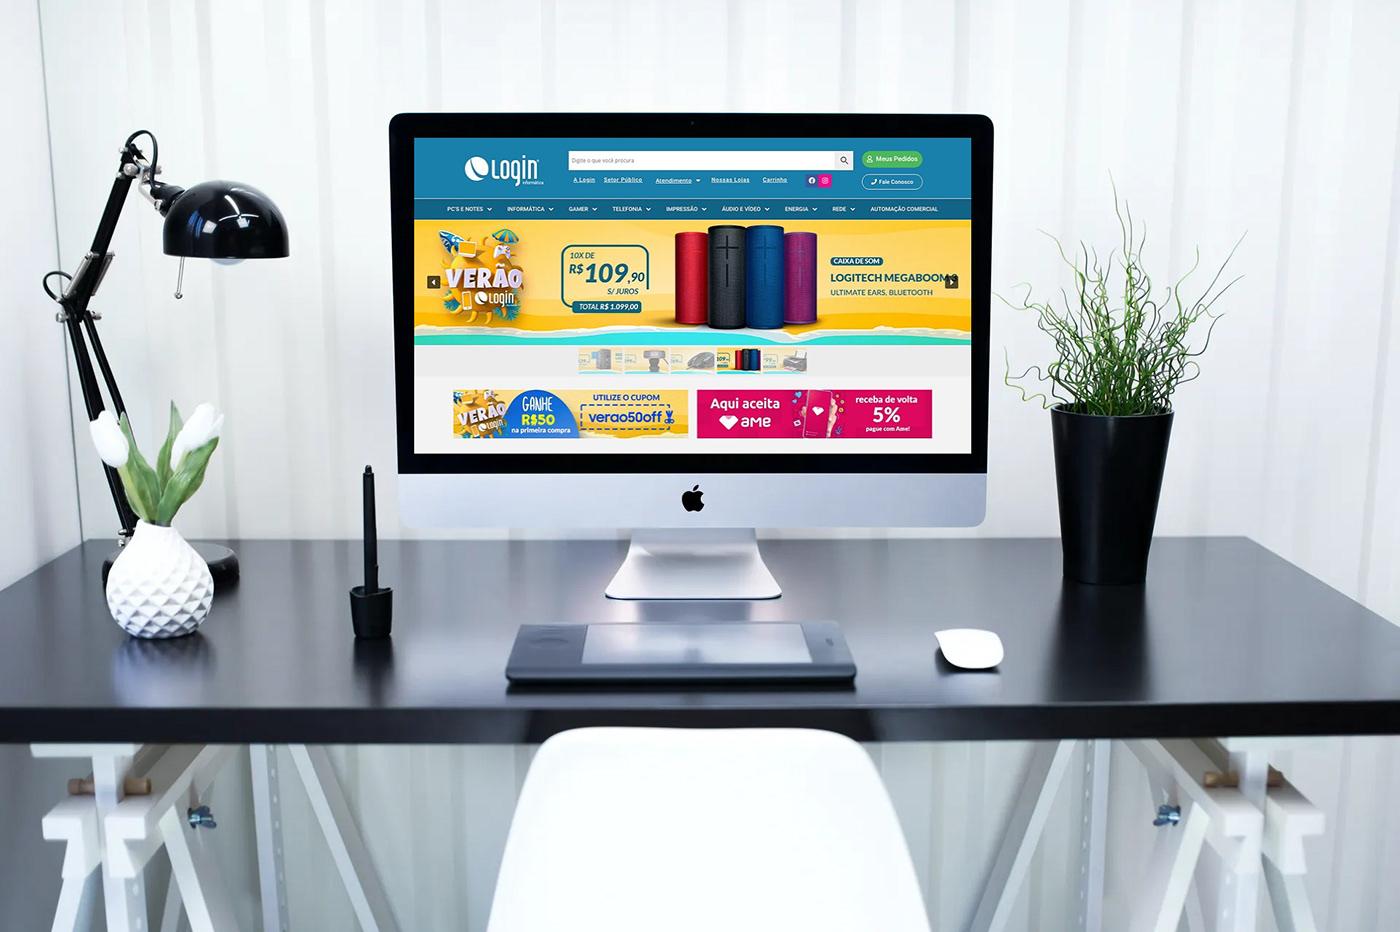 Image may contain: computer, wall and television